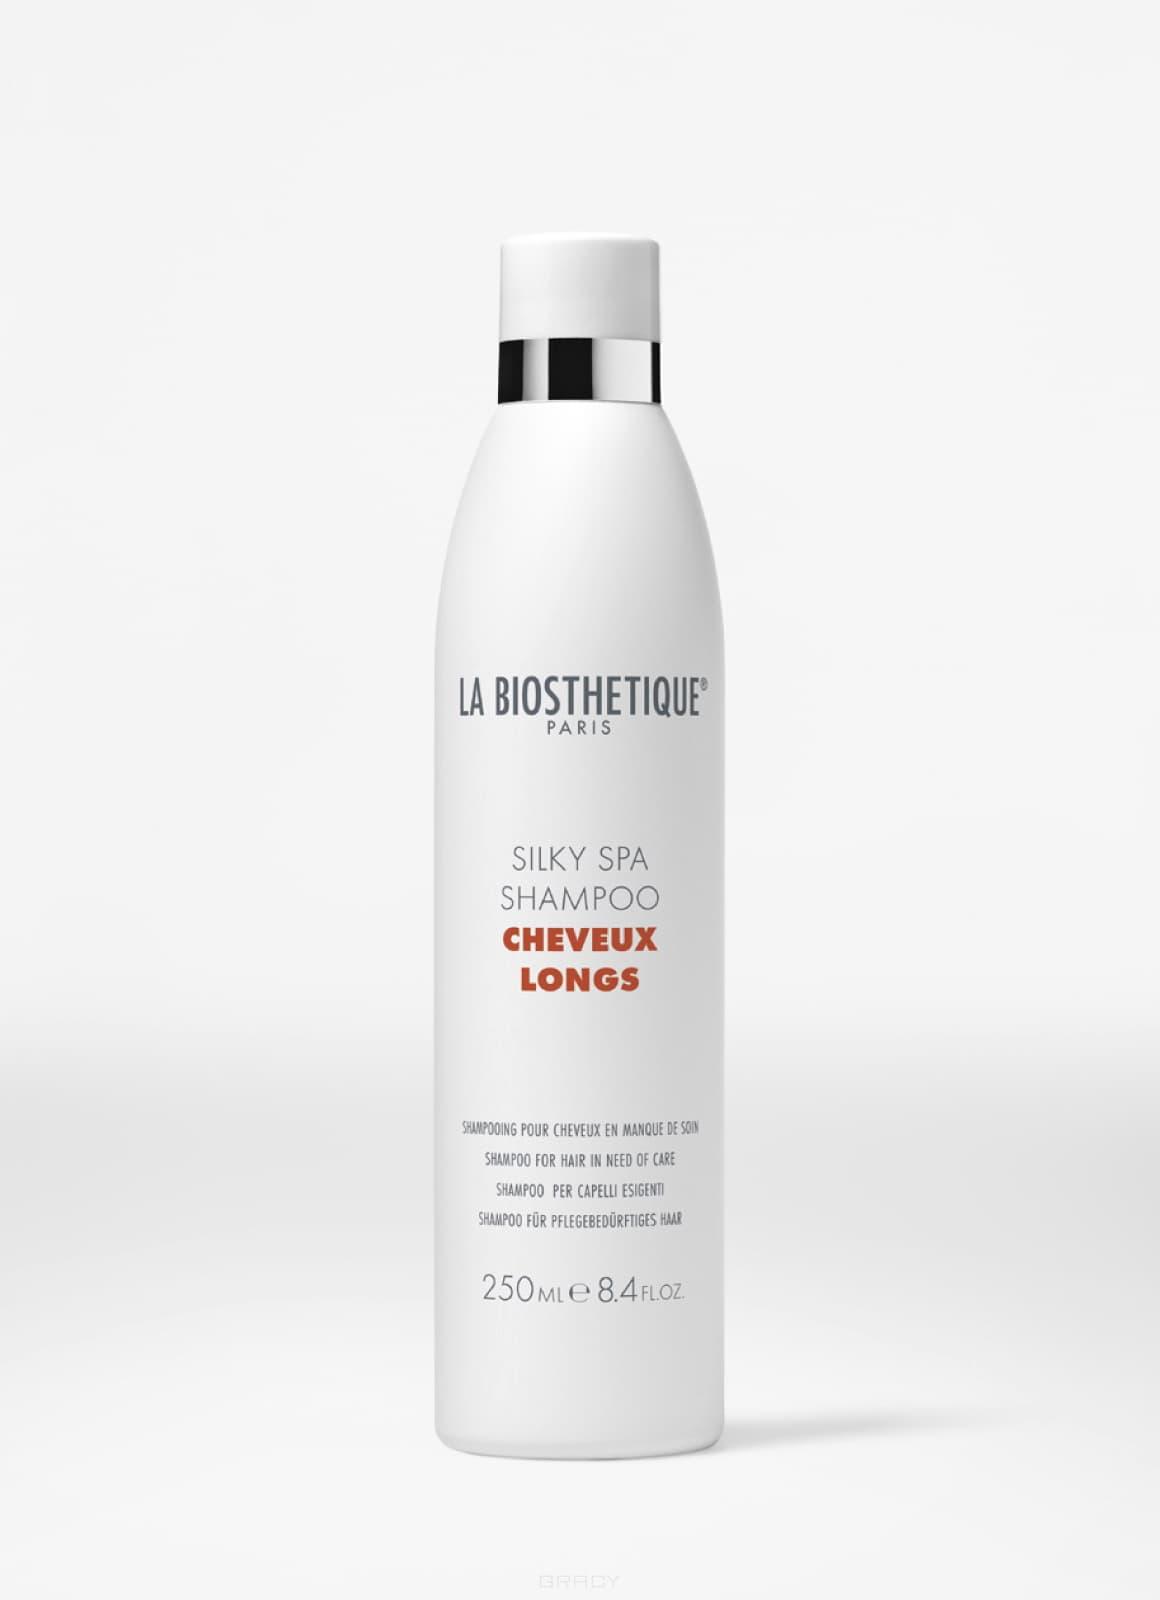 La Biosthetique SPA-шампунь для придания шелковистости длинным волосам Silky Spa Shampoo, 450 мл la biosthetique silky spa shampoo spa шампунь для придания шелковистости длинным волосам 1000 мл